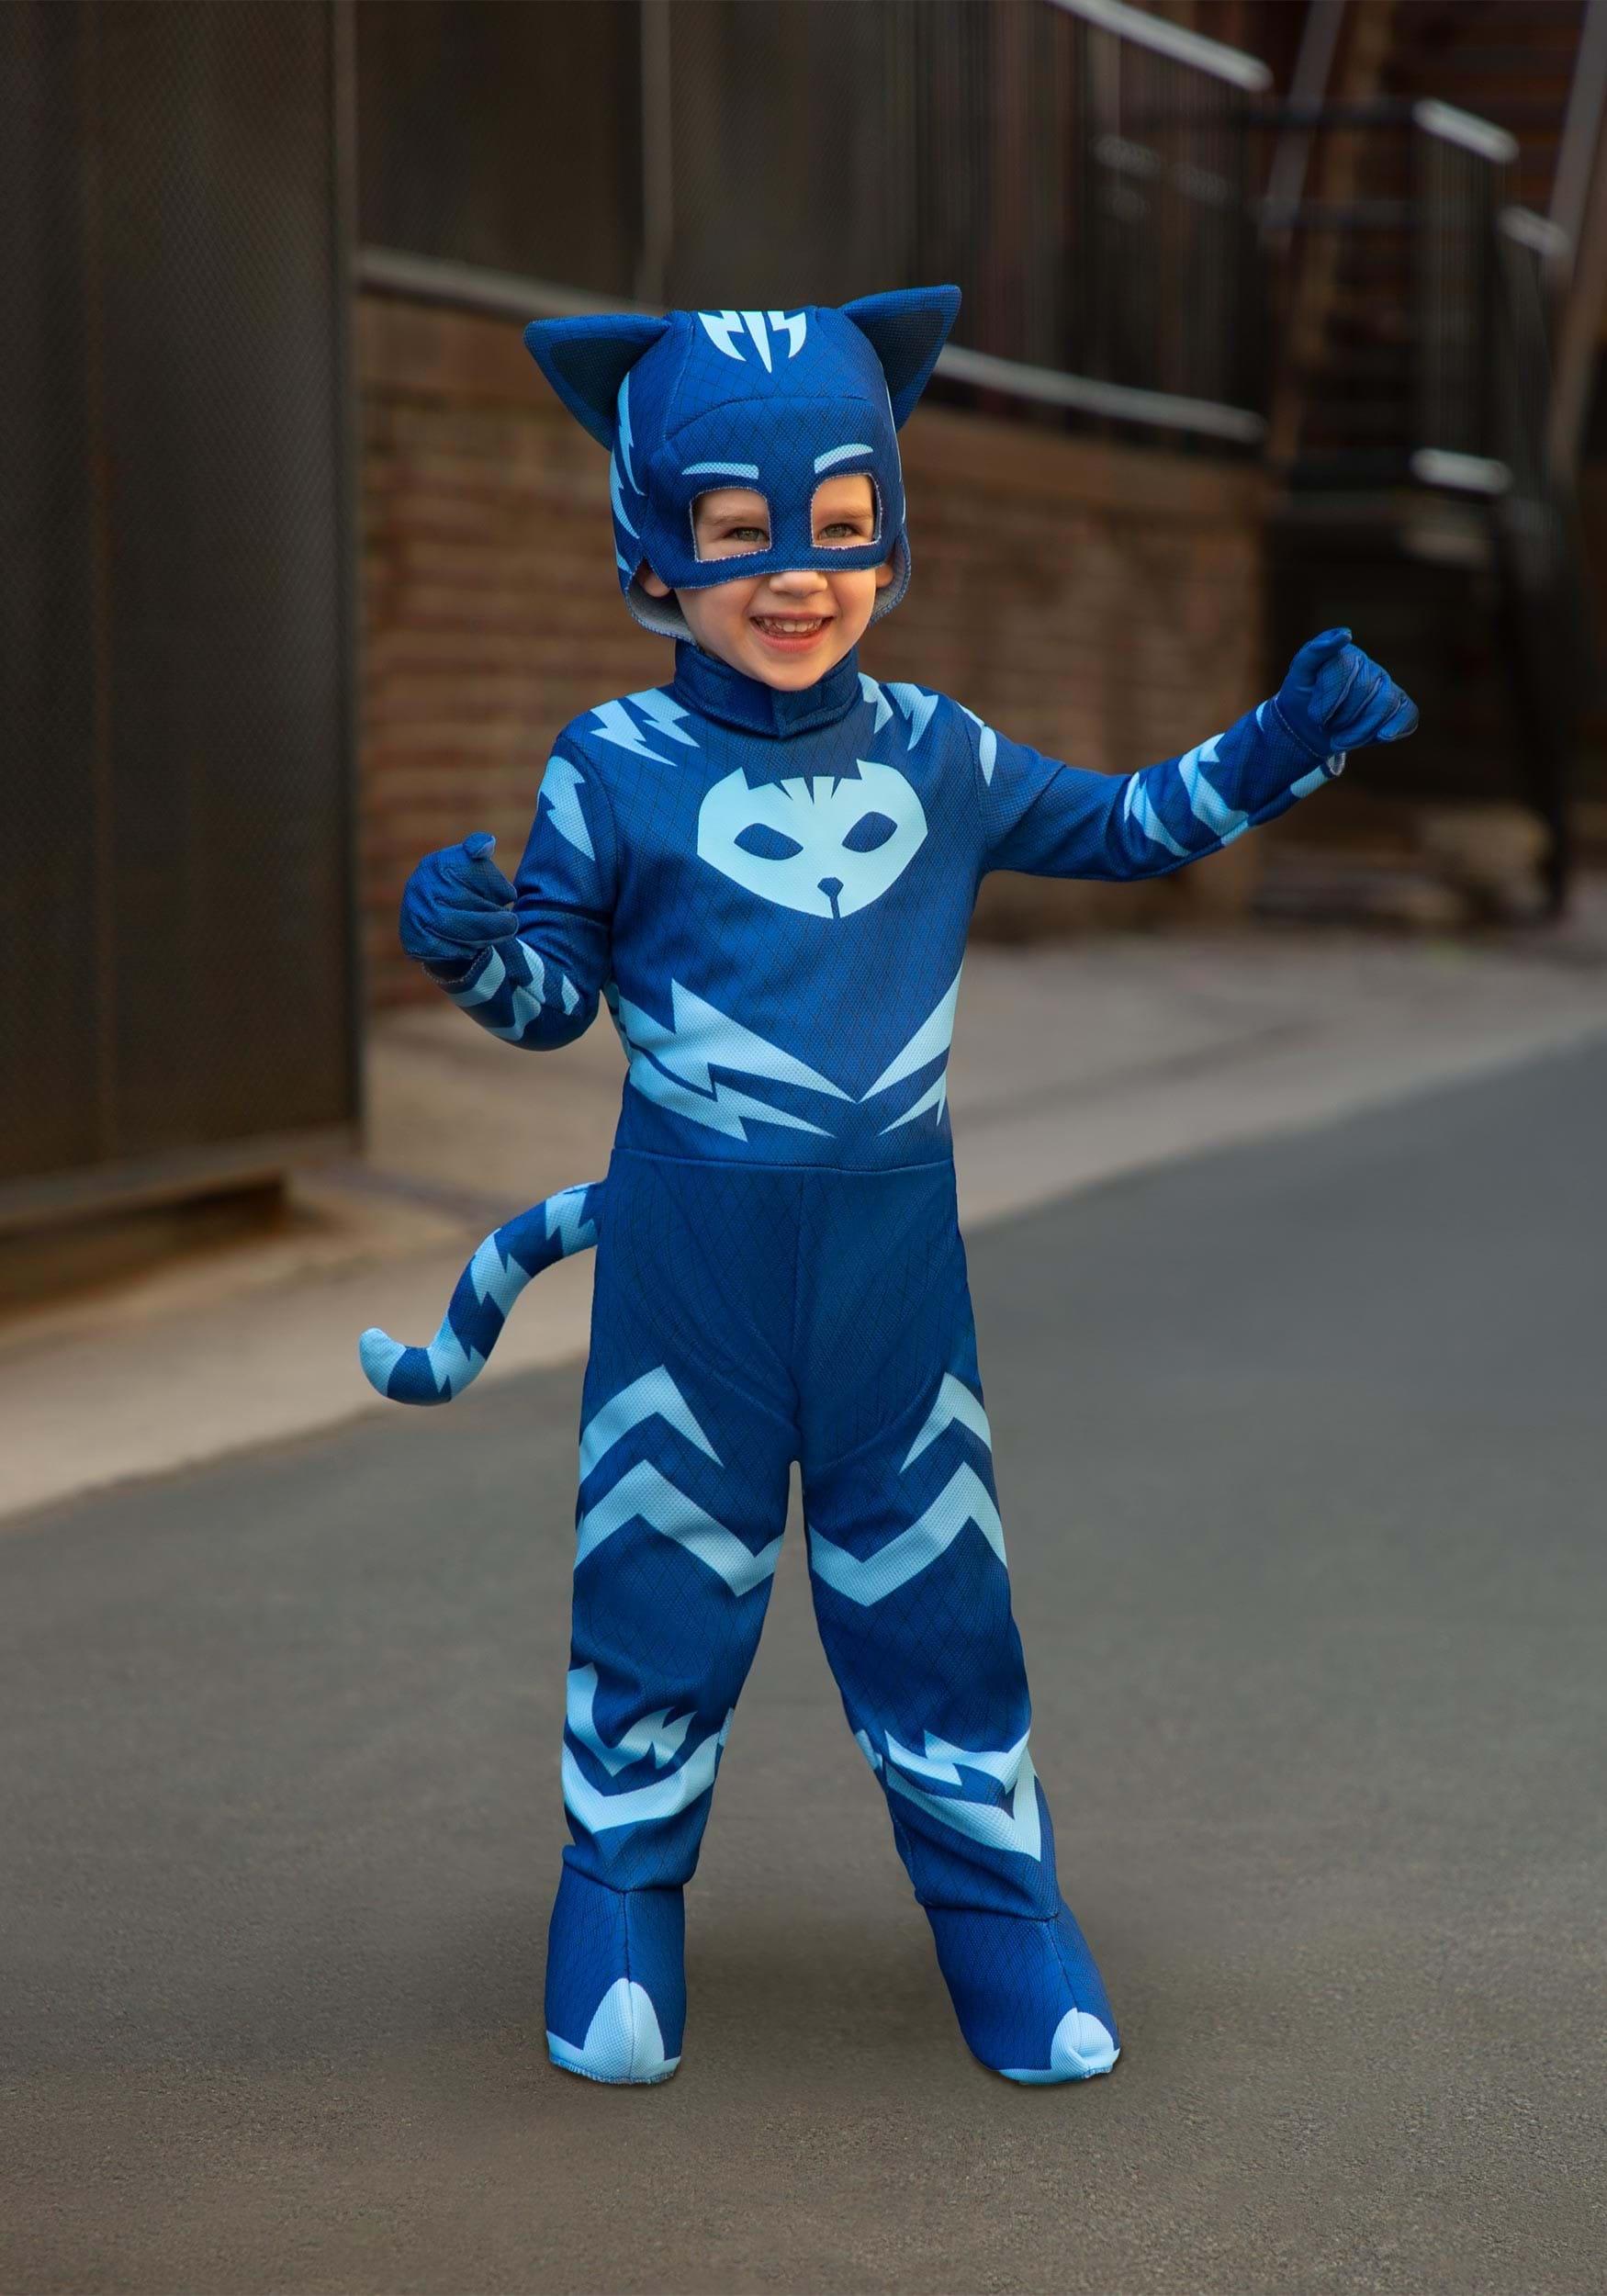 sc 1 st  Fun.com & Deluxe PJ Masks Cat Boy Costume